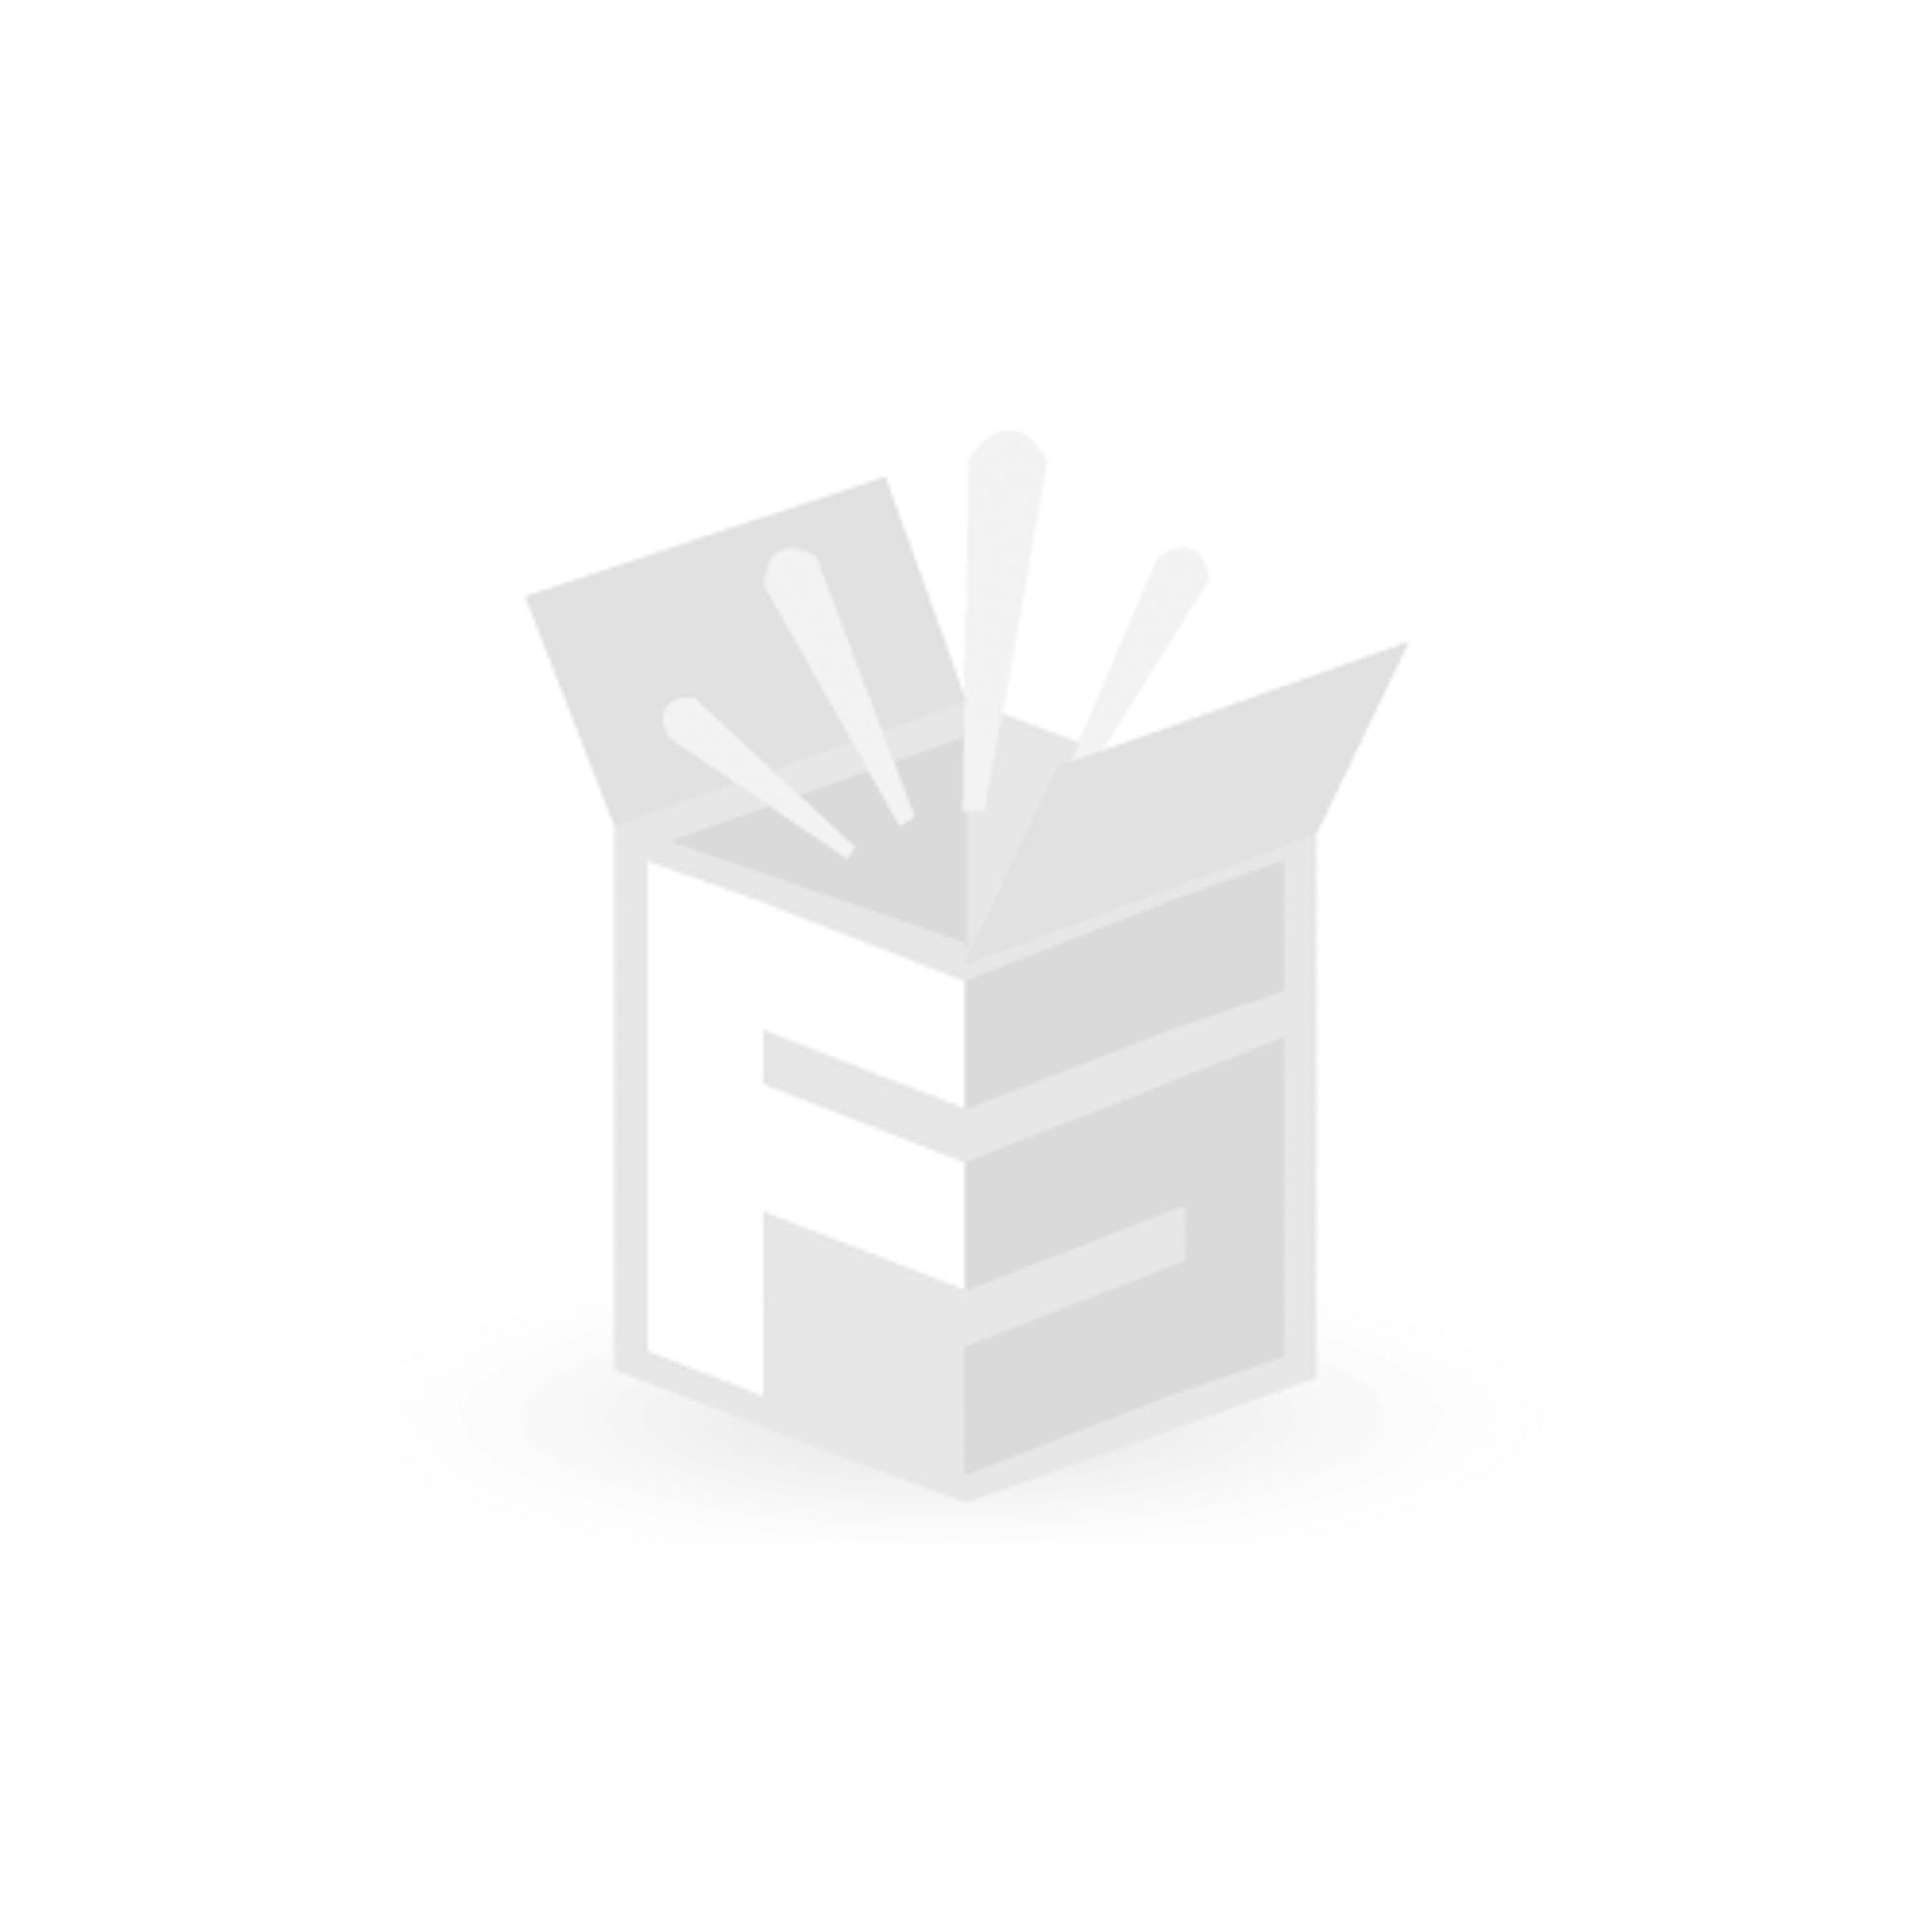 FS-STAR Pic à brochette, 100 pièces